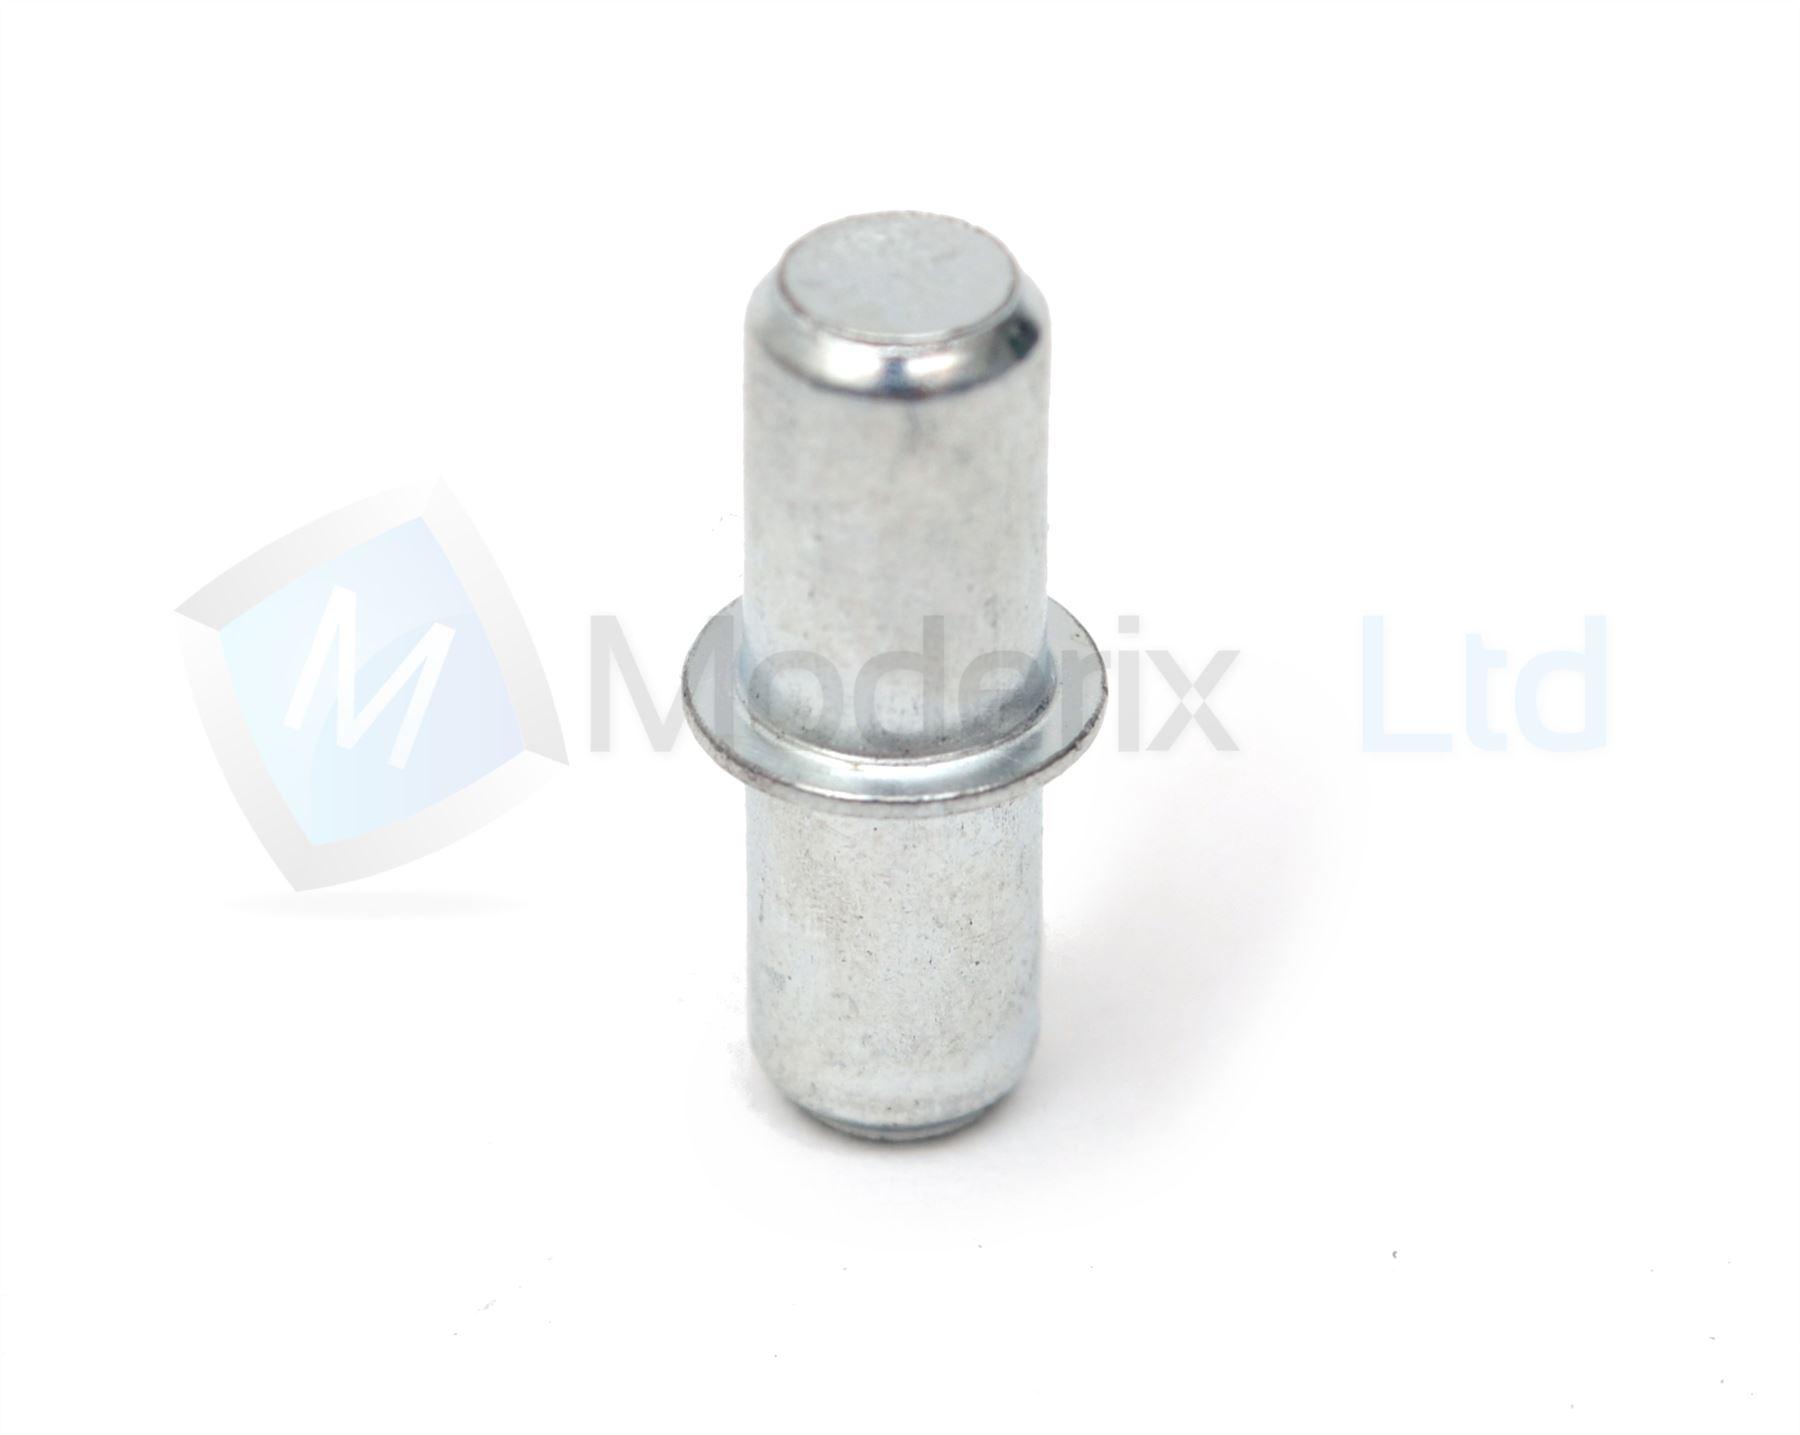 shelf pins glass support pins studs metal peg packs 4 1000 ebay